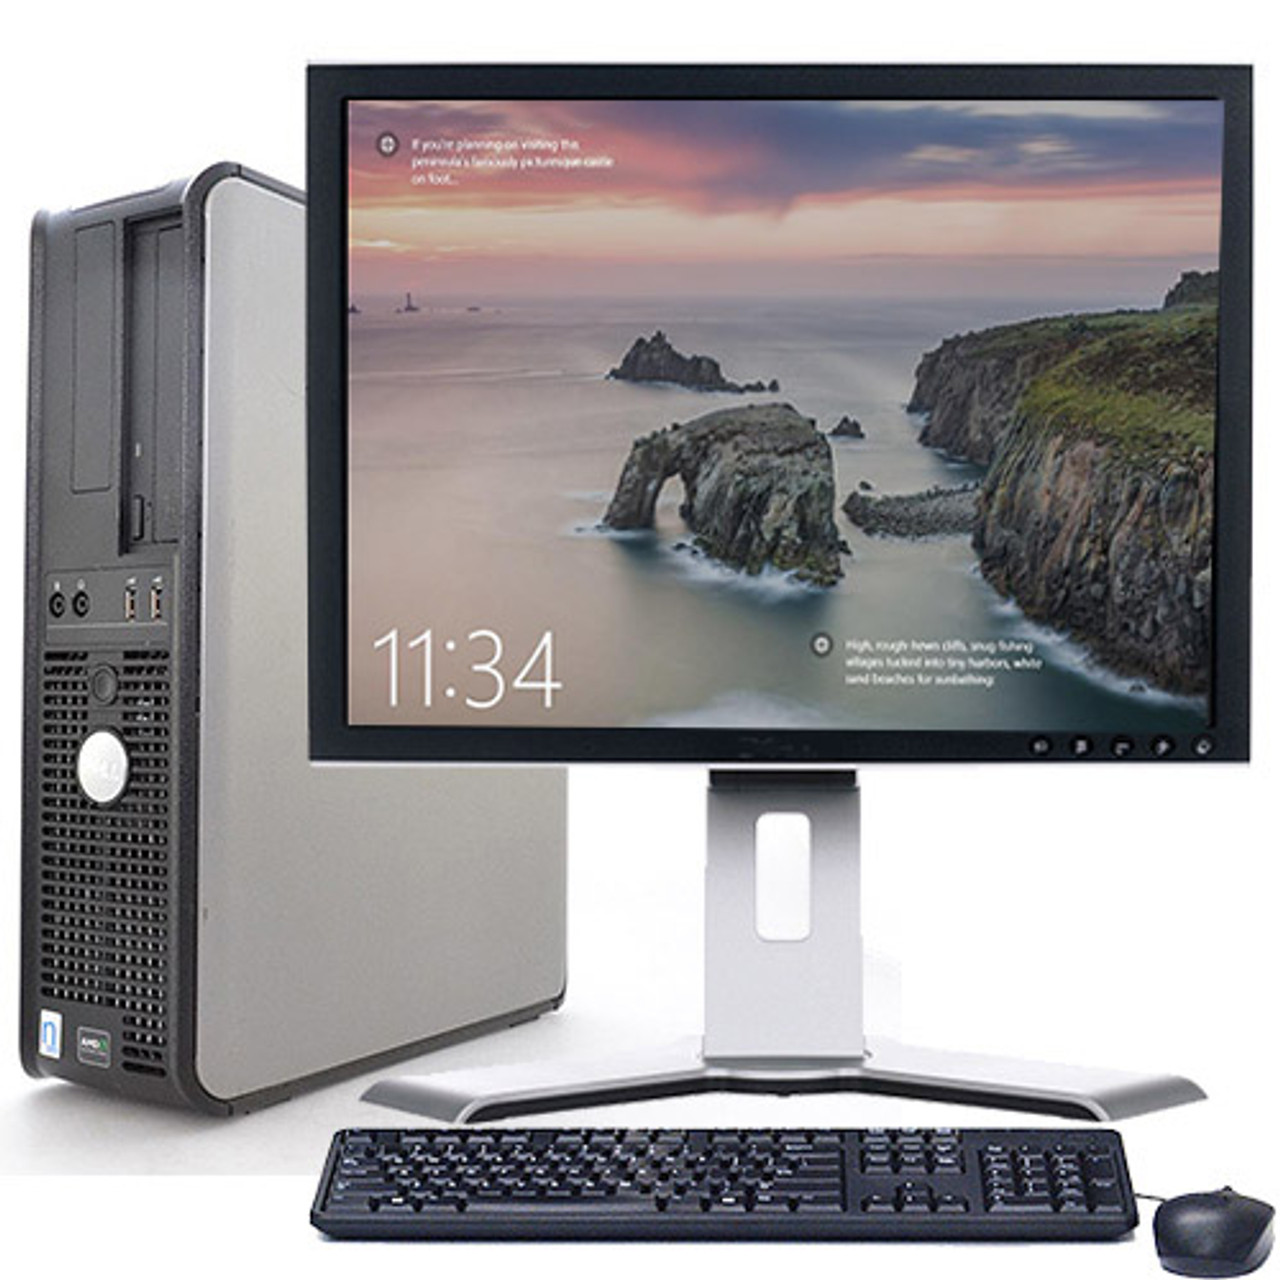 Lot of 5 Dell Optiplex Desktop Computer Windows 10 C2D 3 0ghz 4gb 120GB SSD  19